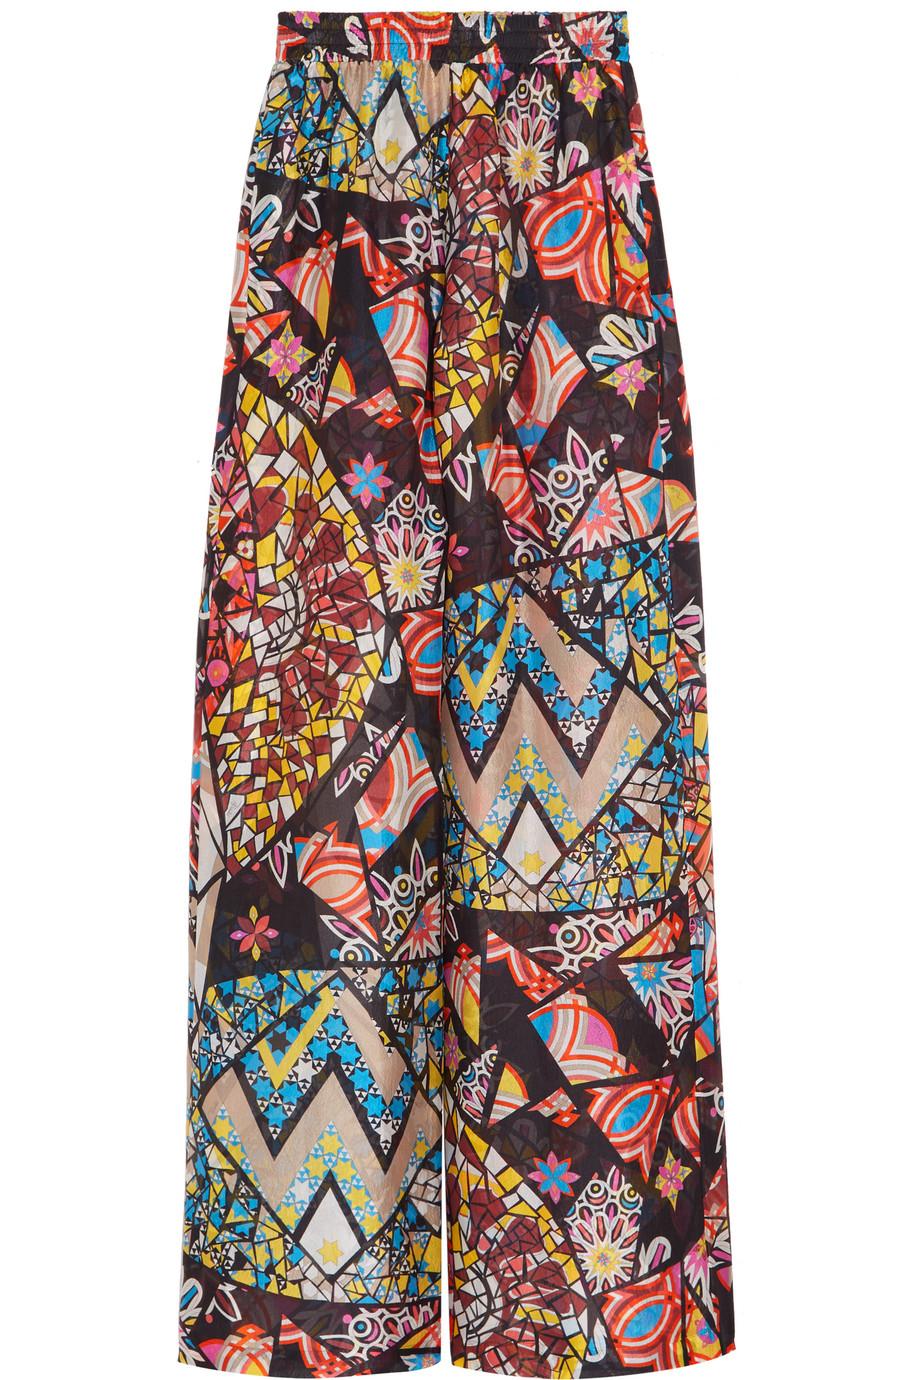 Emilio Pucci Printed Hammered-Silk Wide-Leg Pants, Fuchsia, Women's, Size: 38